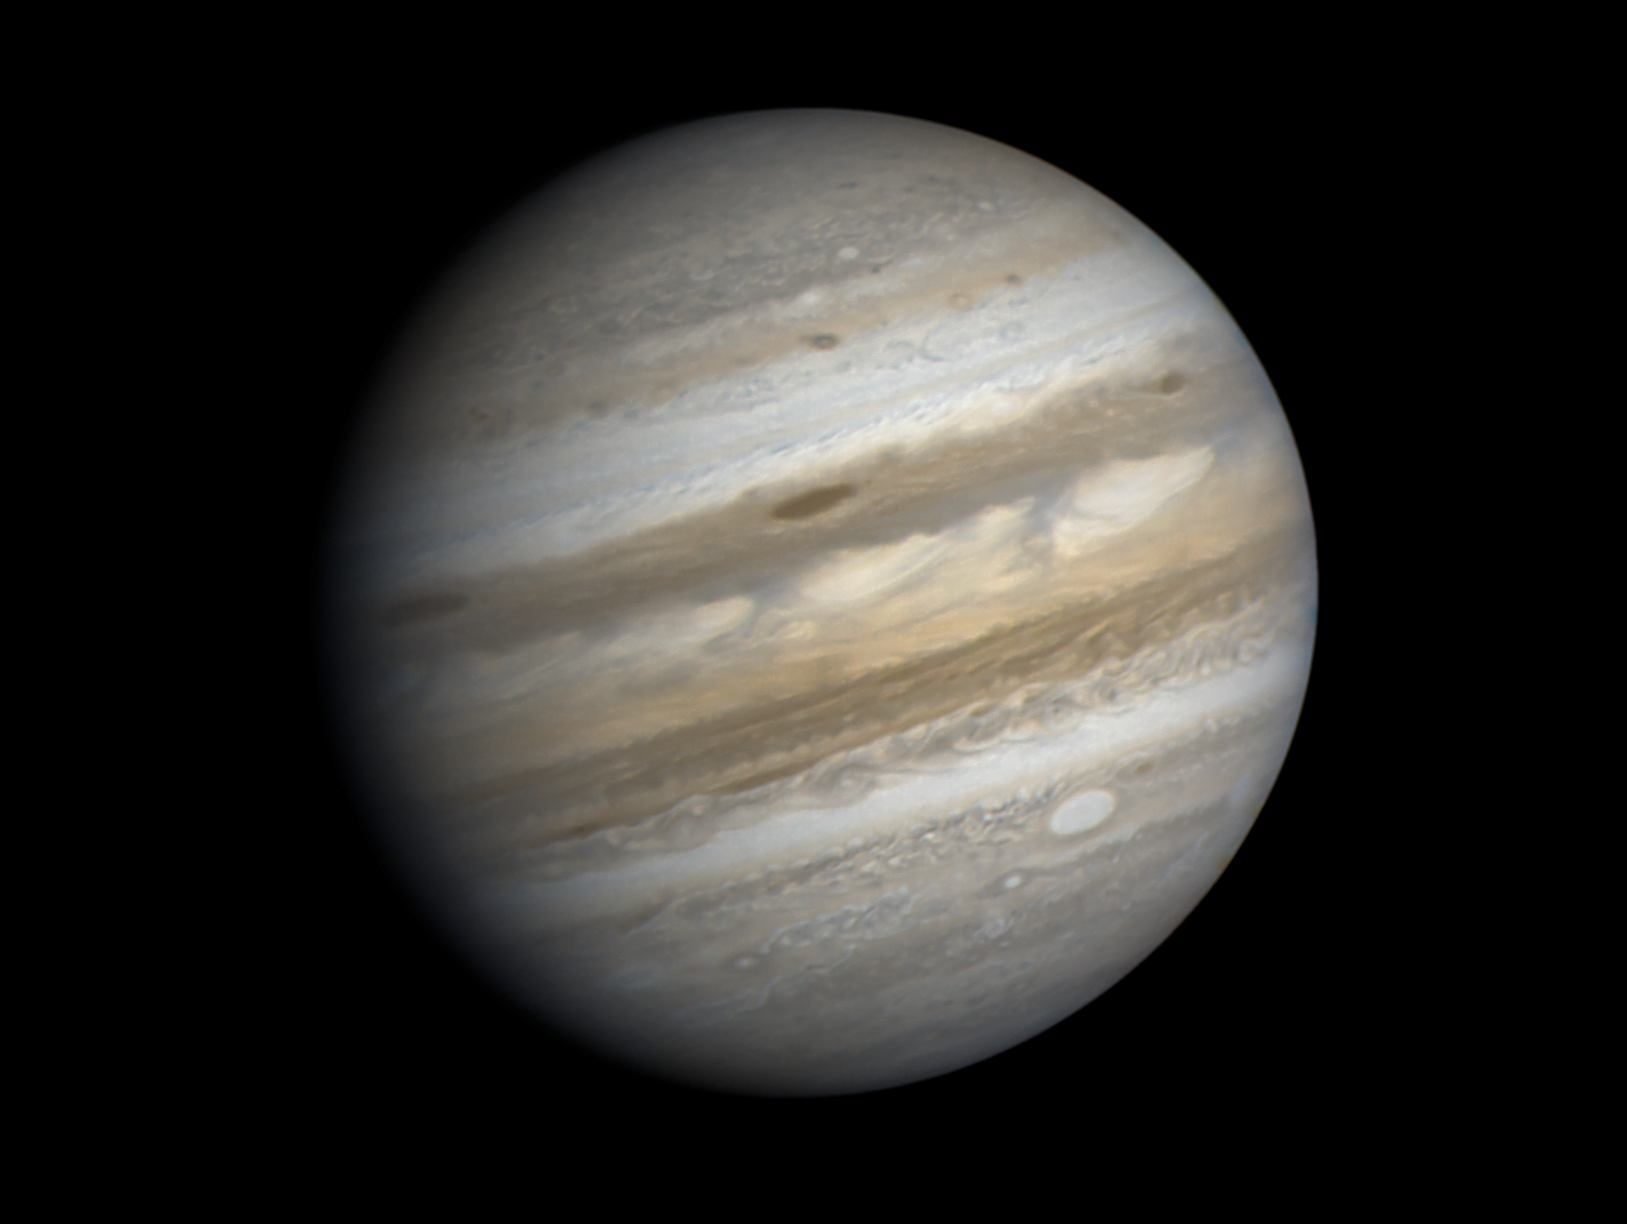 Юпитер, снимок зонда Вояджер-1